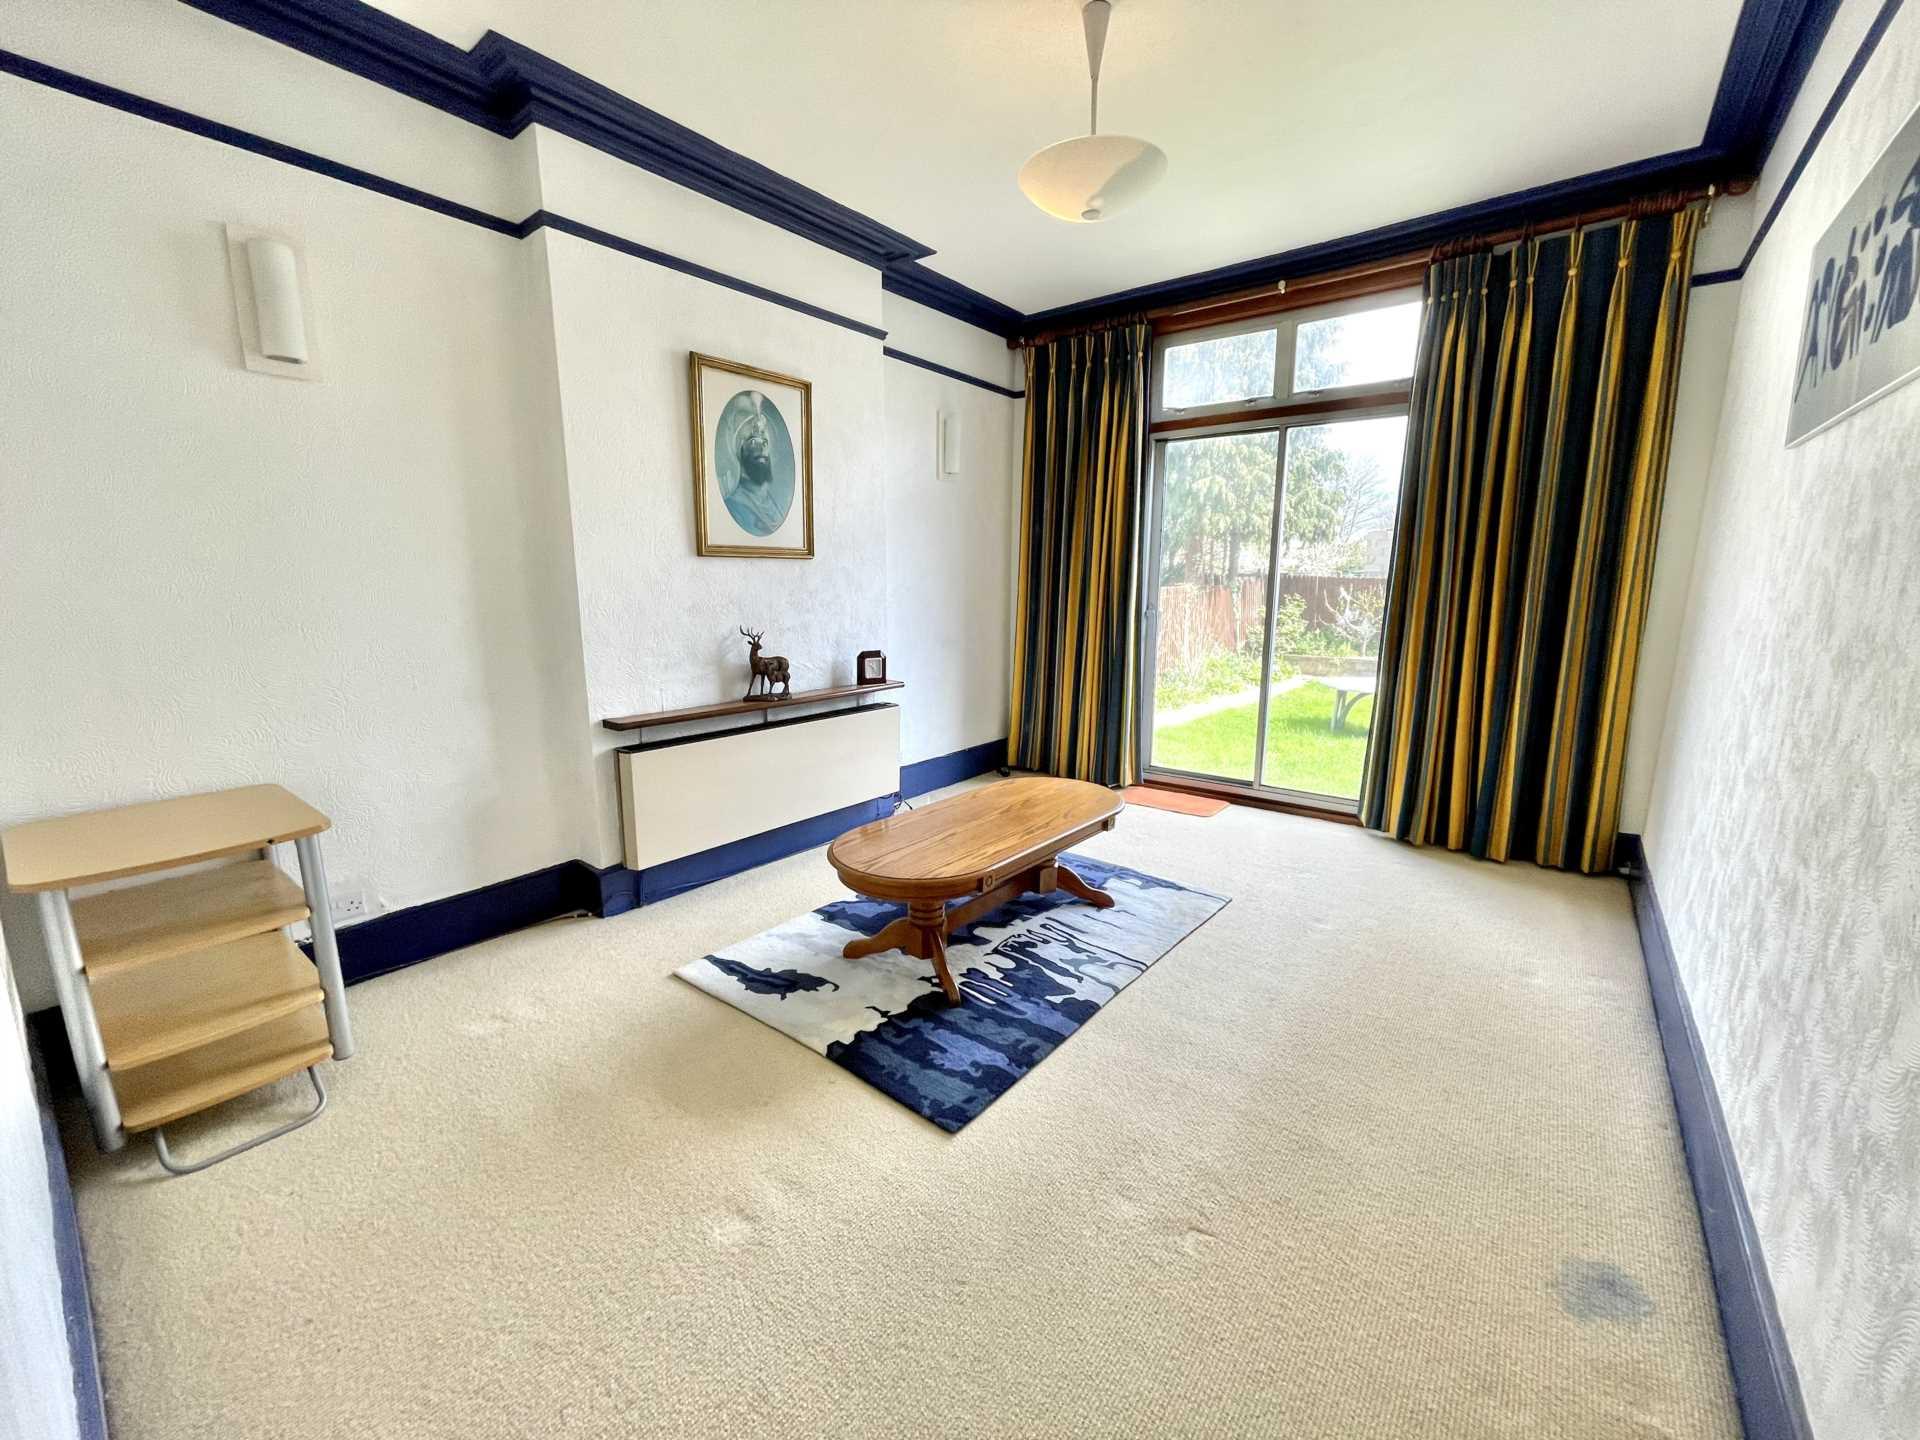 Lodge Road, Croydon, Image 7